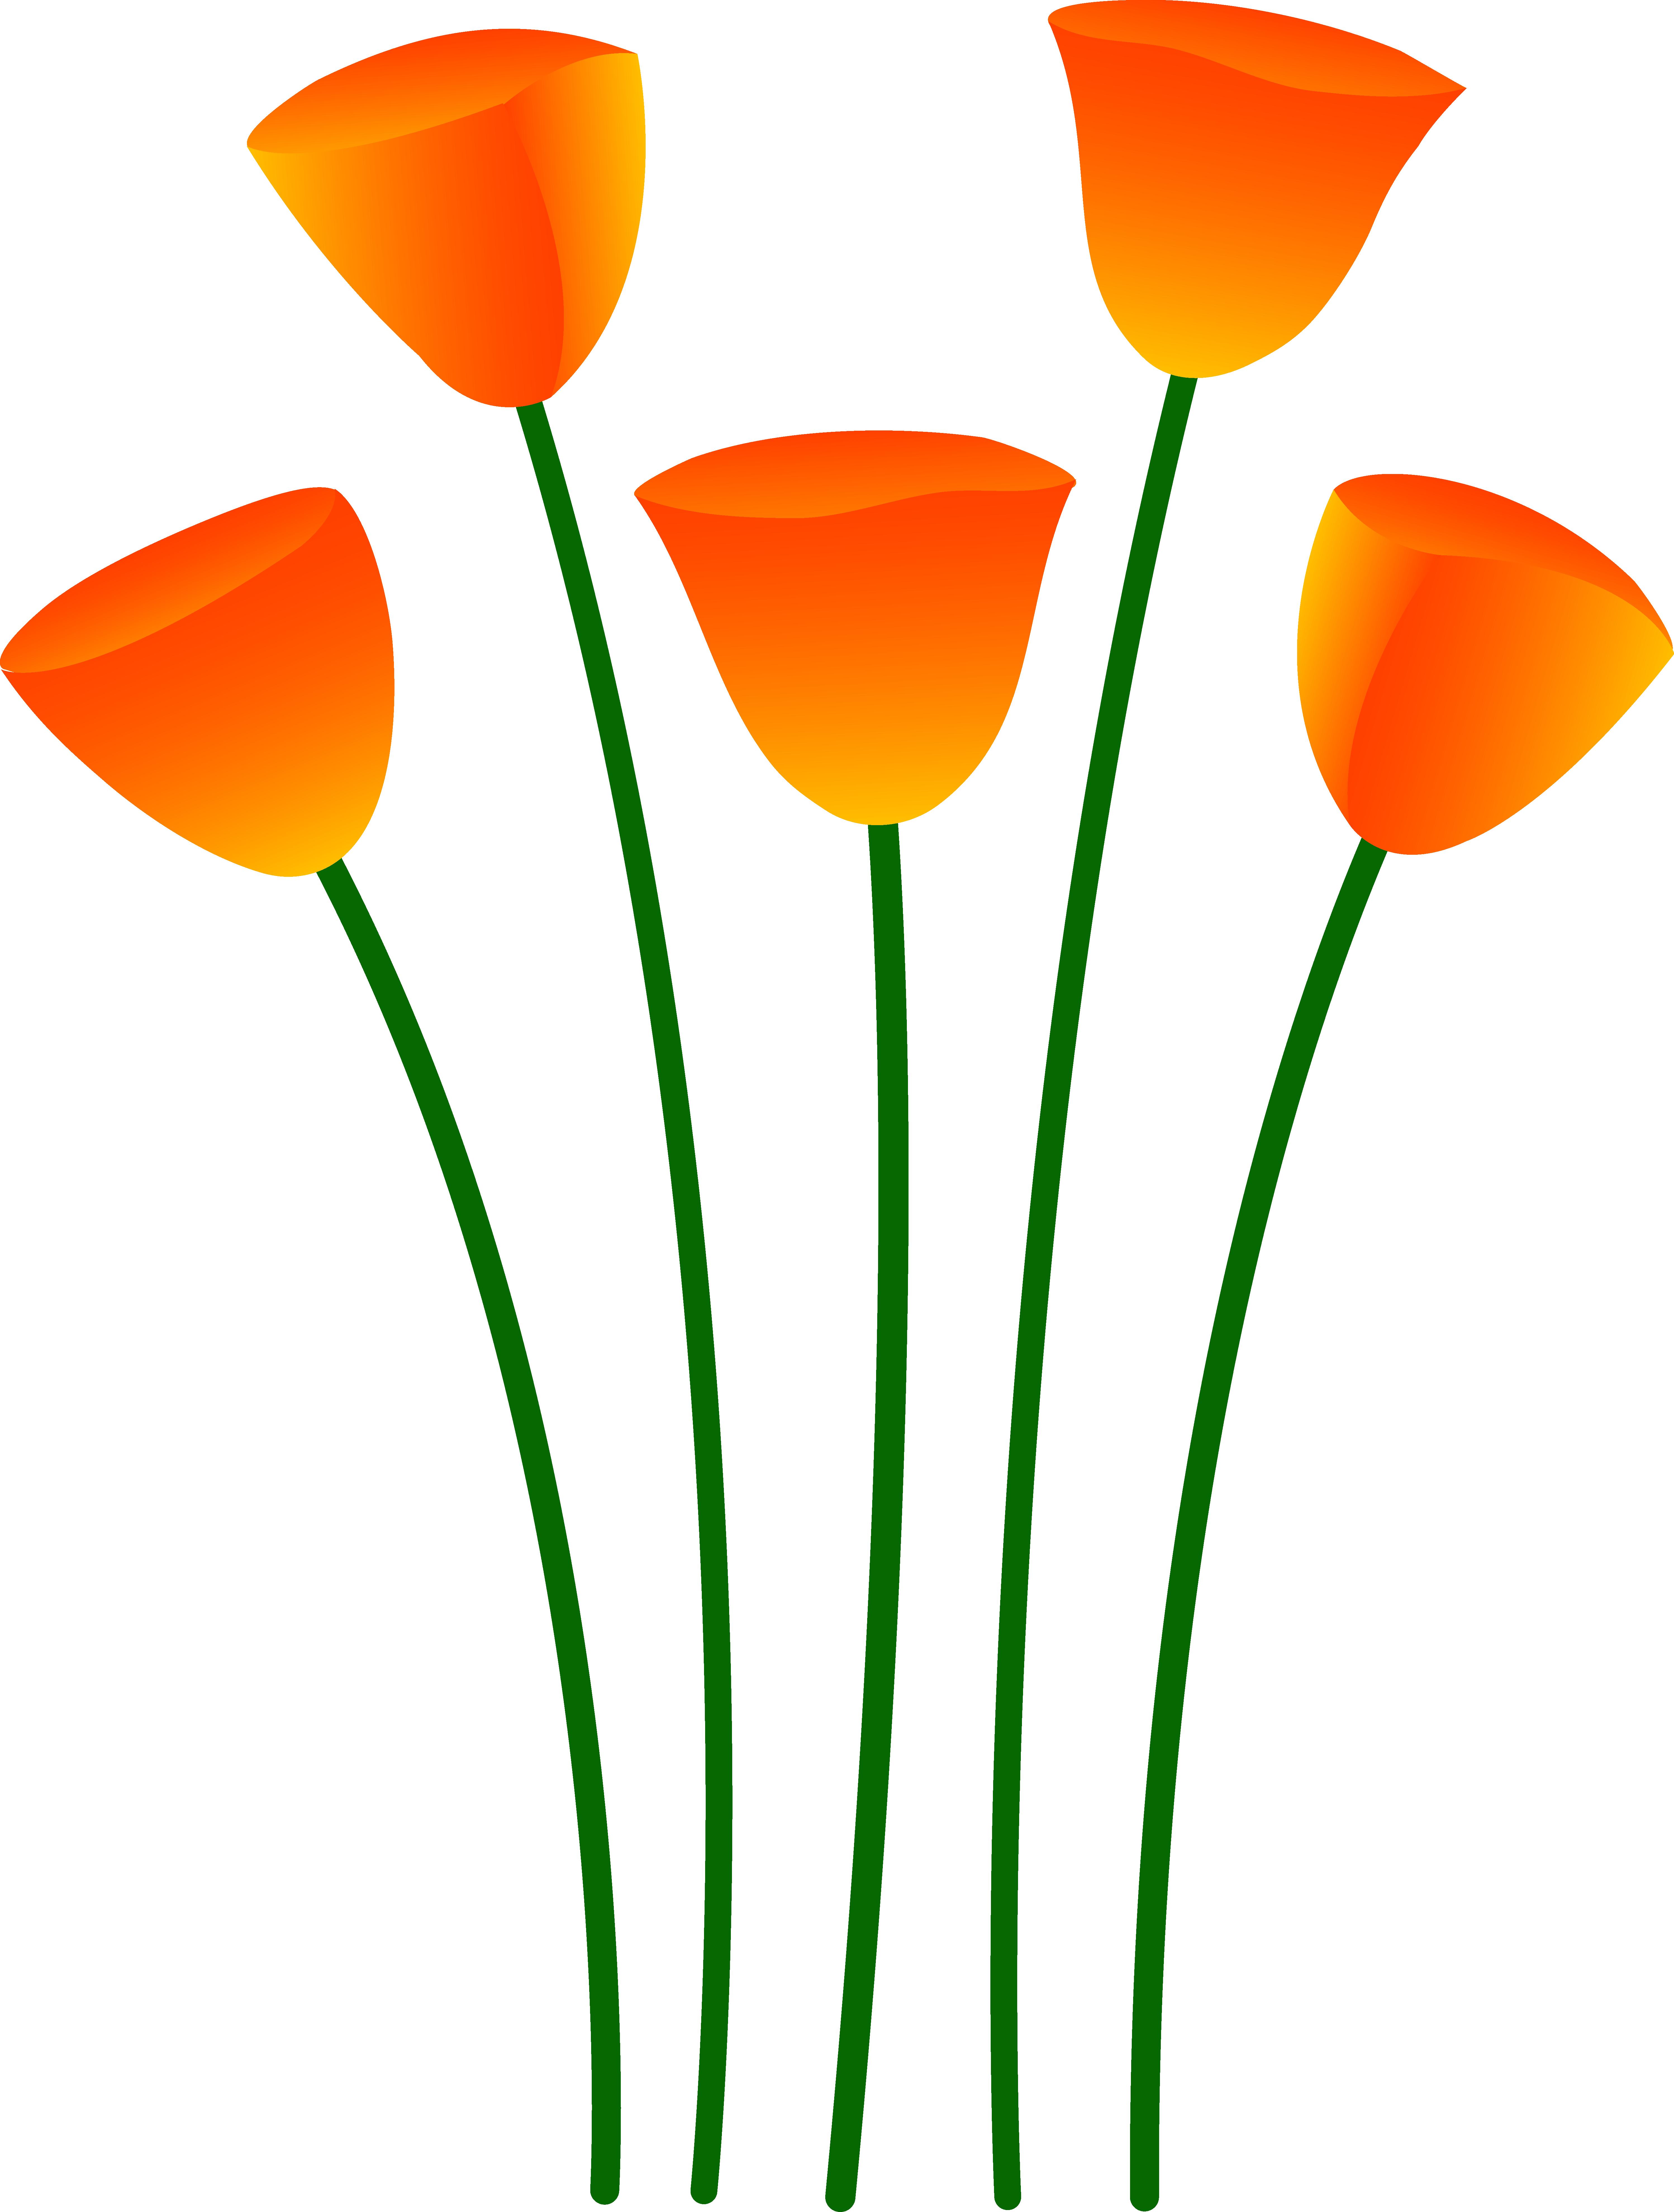 Poppy clipart orange tulip. Flowers free clip art